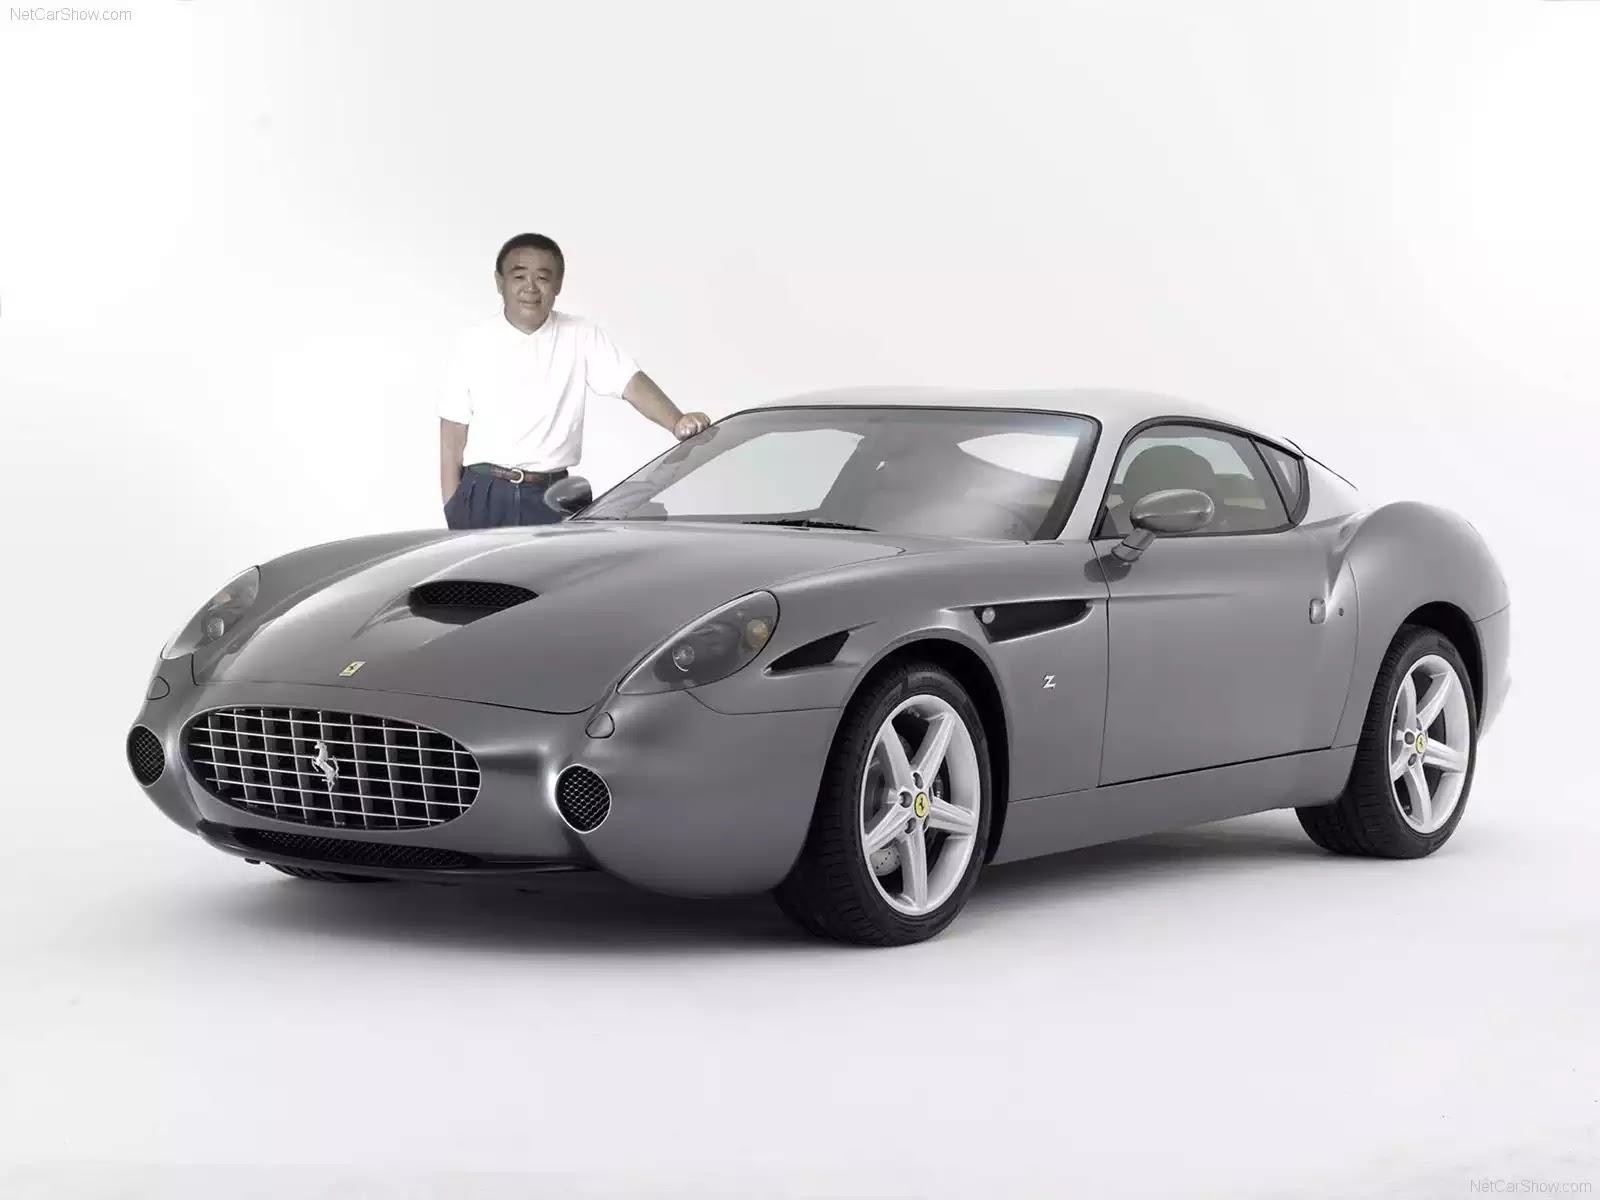 Hình ảnh siêu xe Ferrari 575 GTZ Zagato 2006 & nội ngoại thất